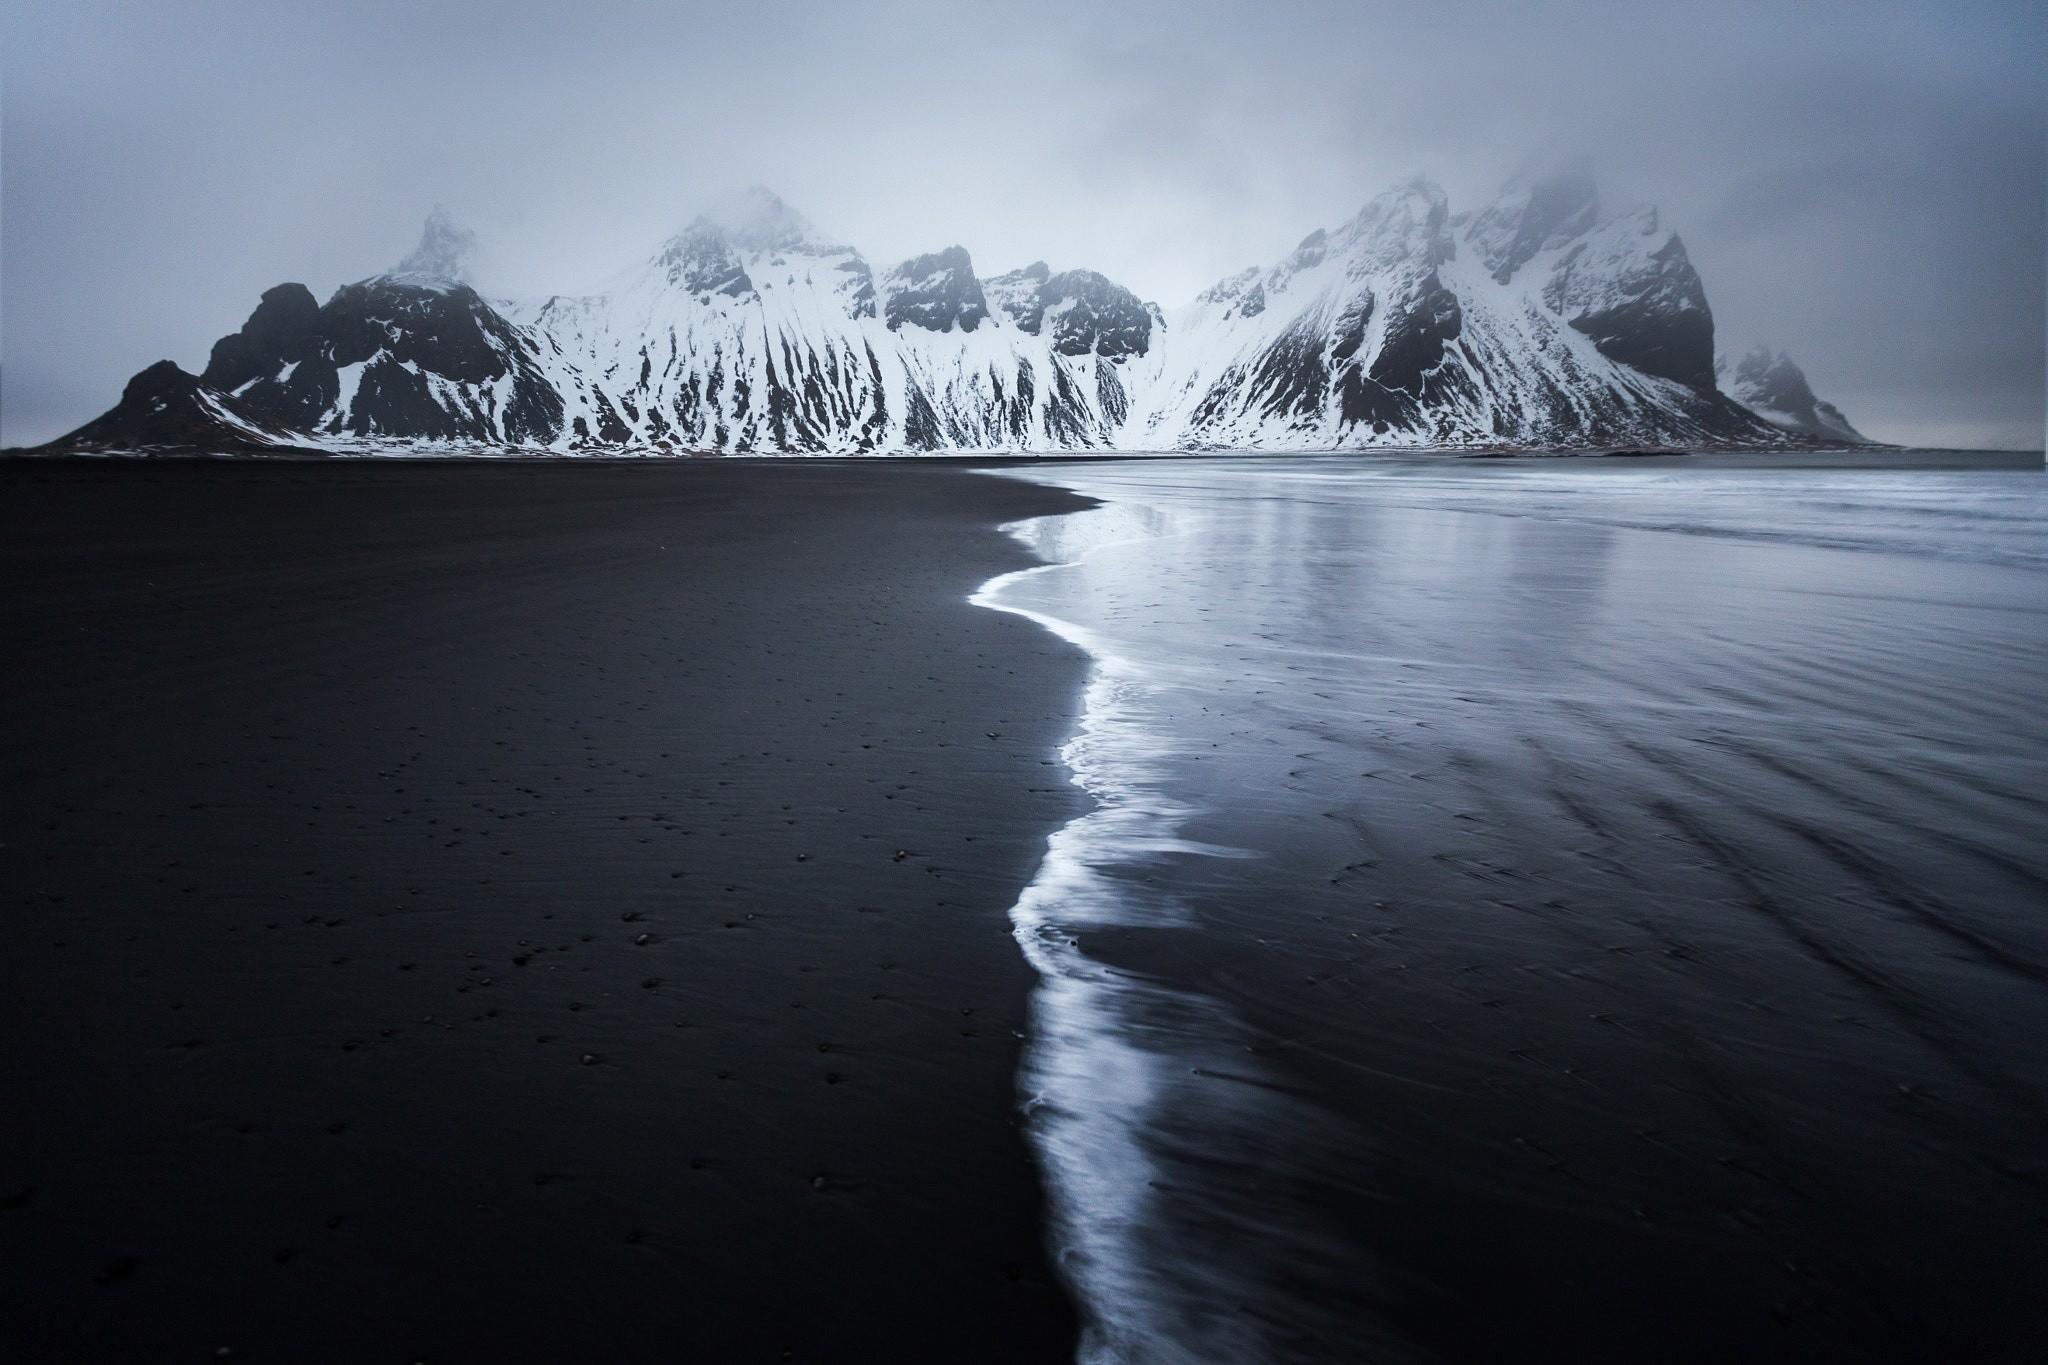 Res: 2048x1365, #dark, #monochrome, #landscape, #snow, #coast, #black sand, #mountains,  #sea, #nature, #beach, wallpaper